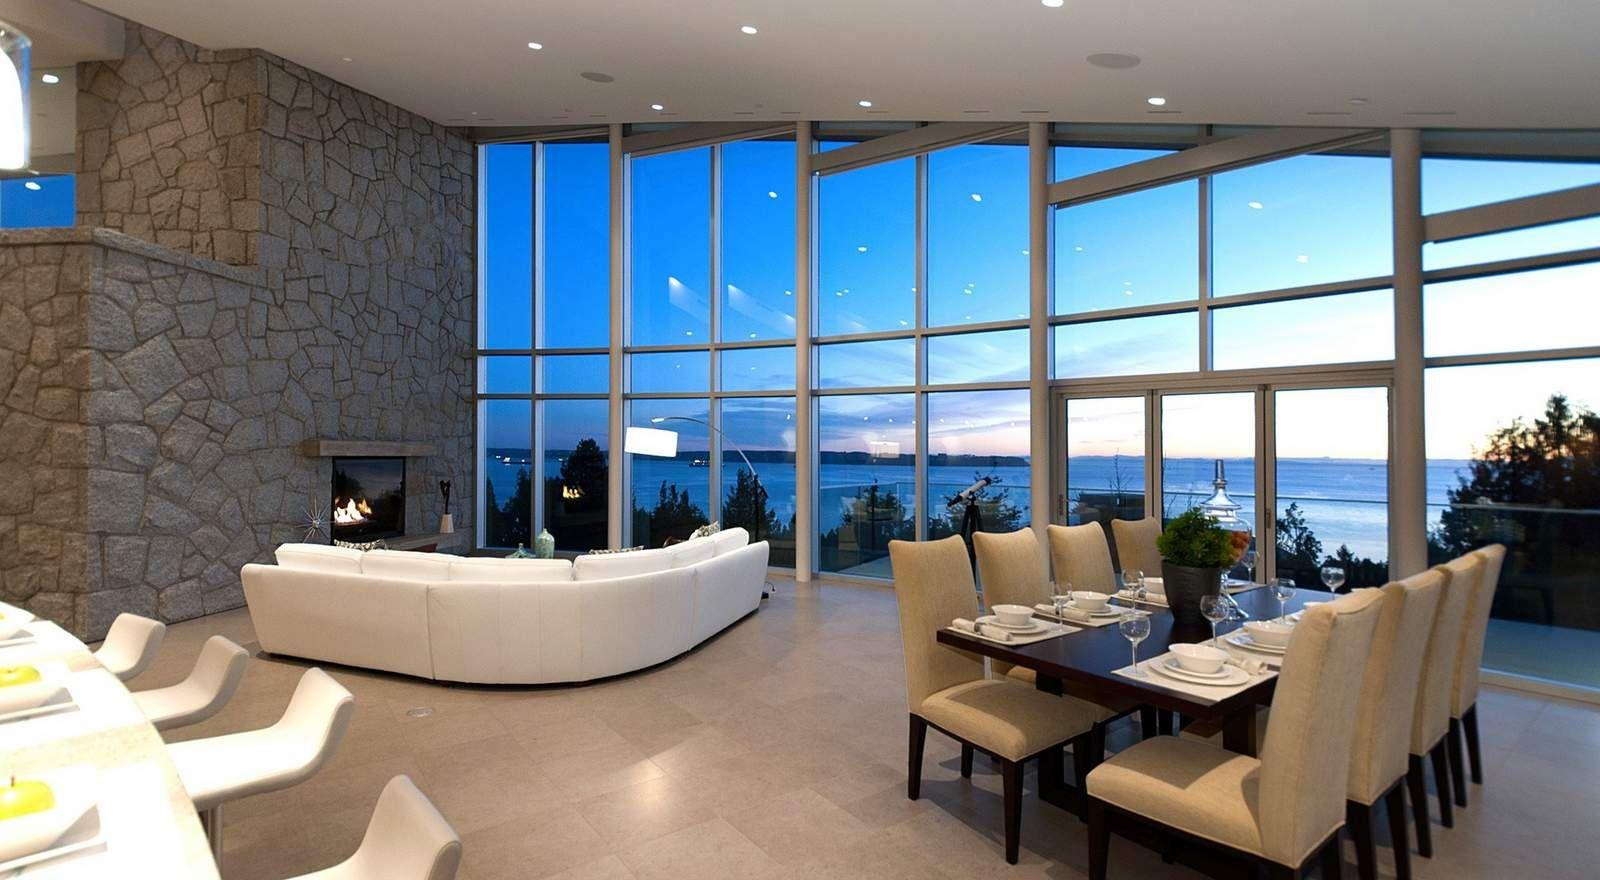 Amazing Commercial Glass Wall Http Www Garretyglass Com Ocean